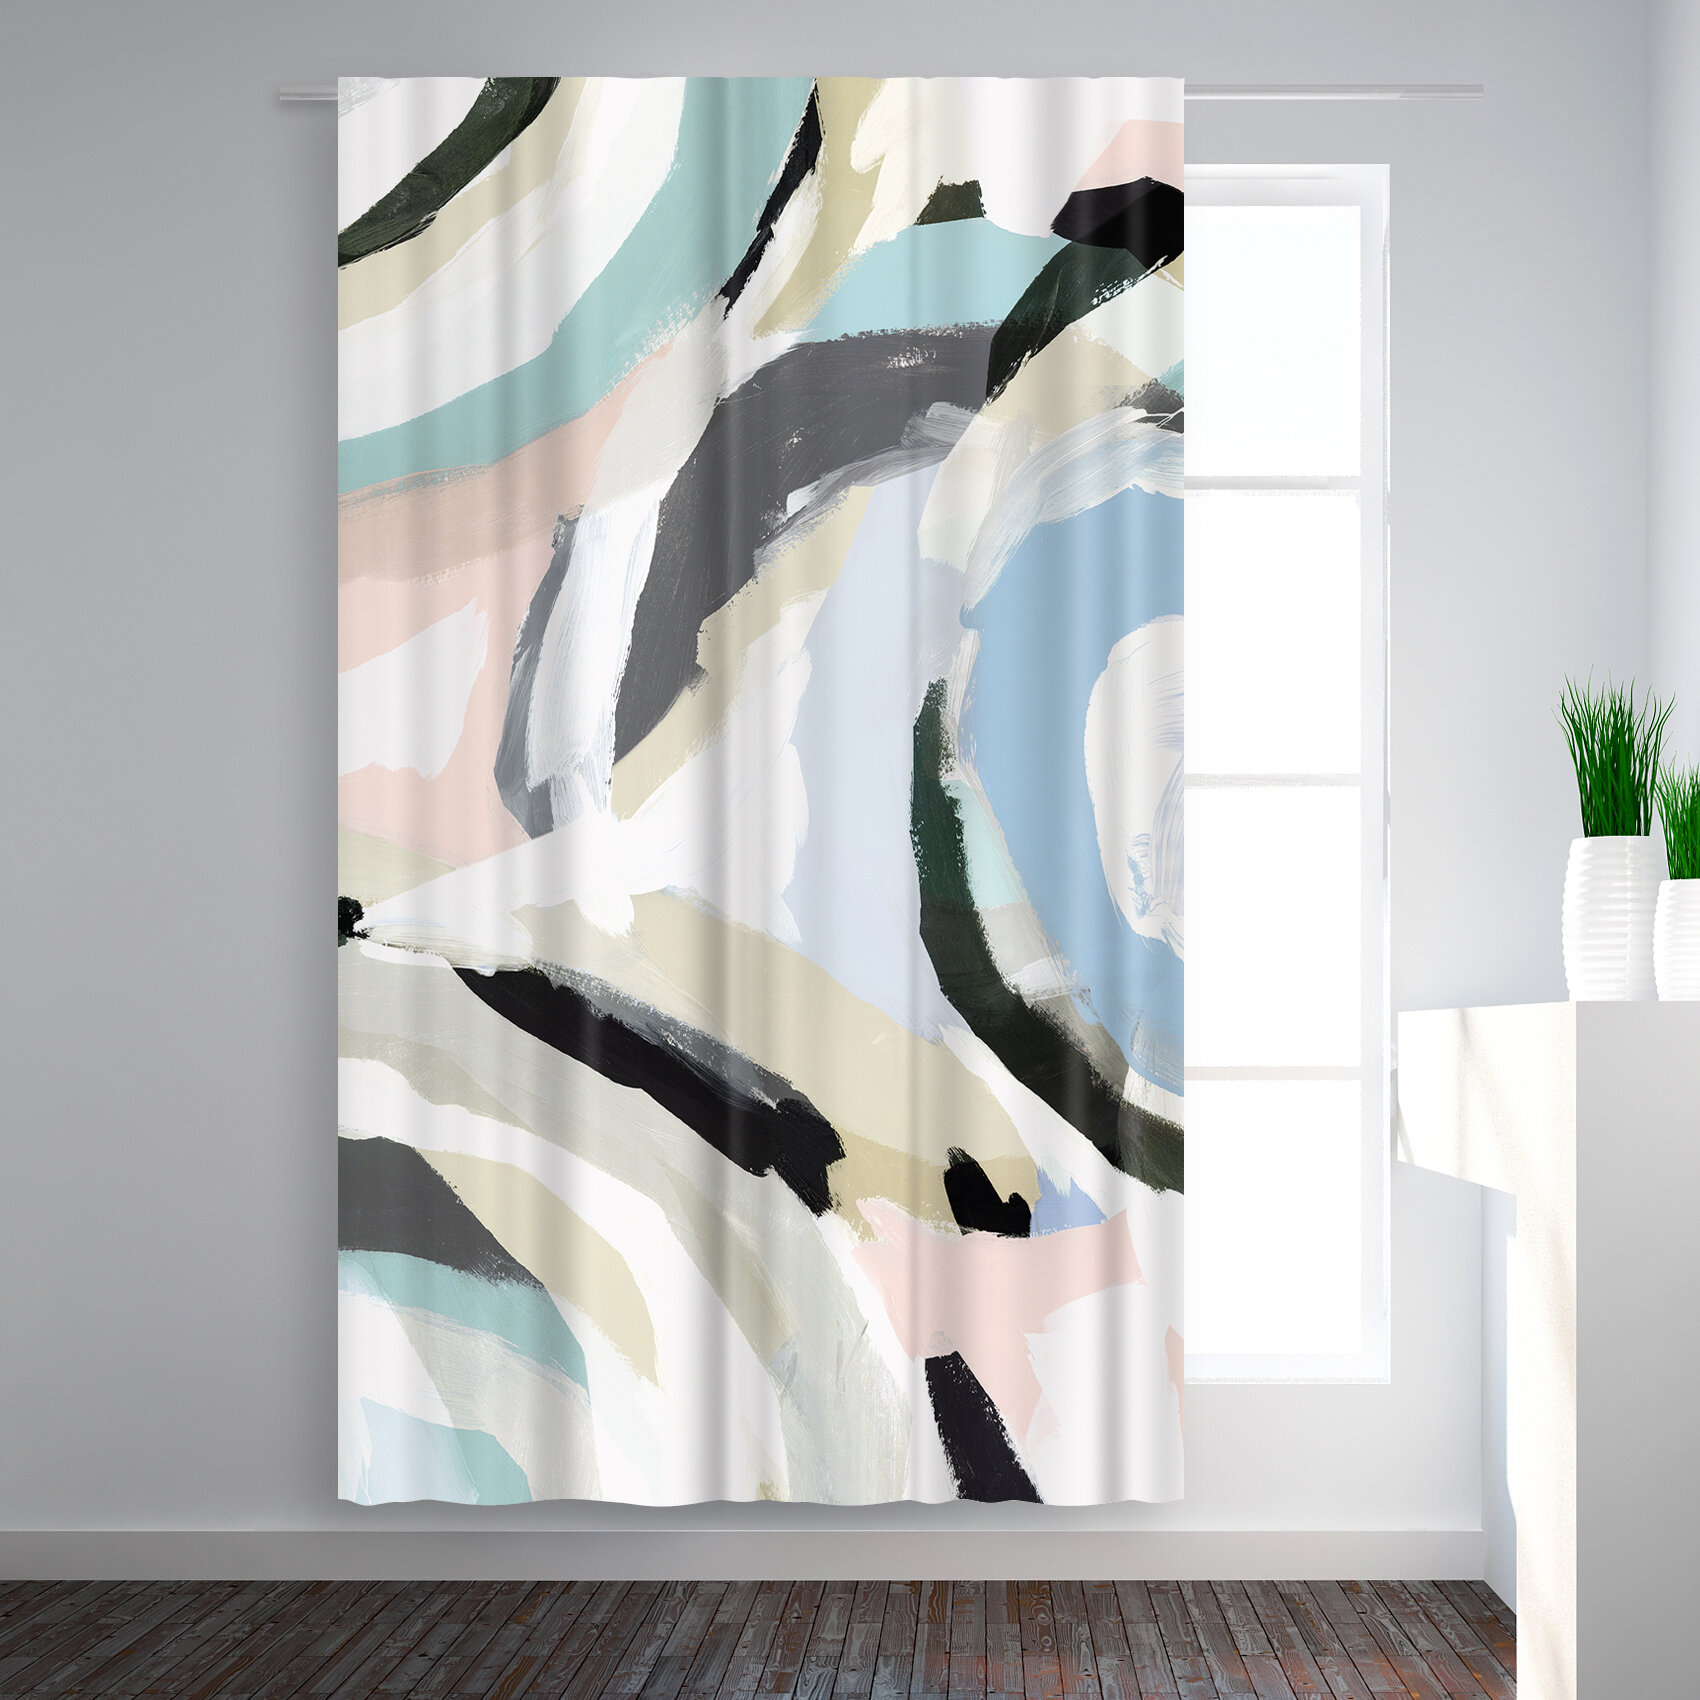 East Urban Home Pi Creative Art Galore Ii Abstract Blackout Rod Pocket Single Curtain Panel Wayfair